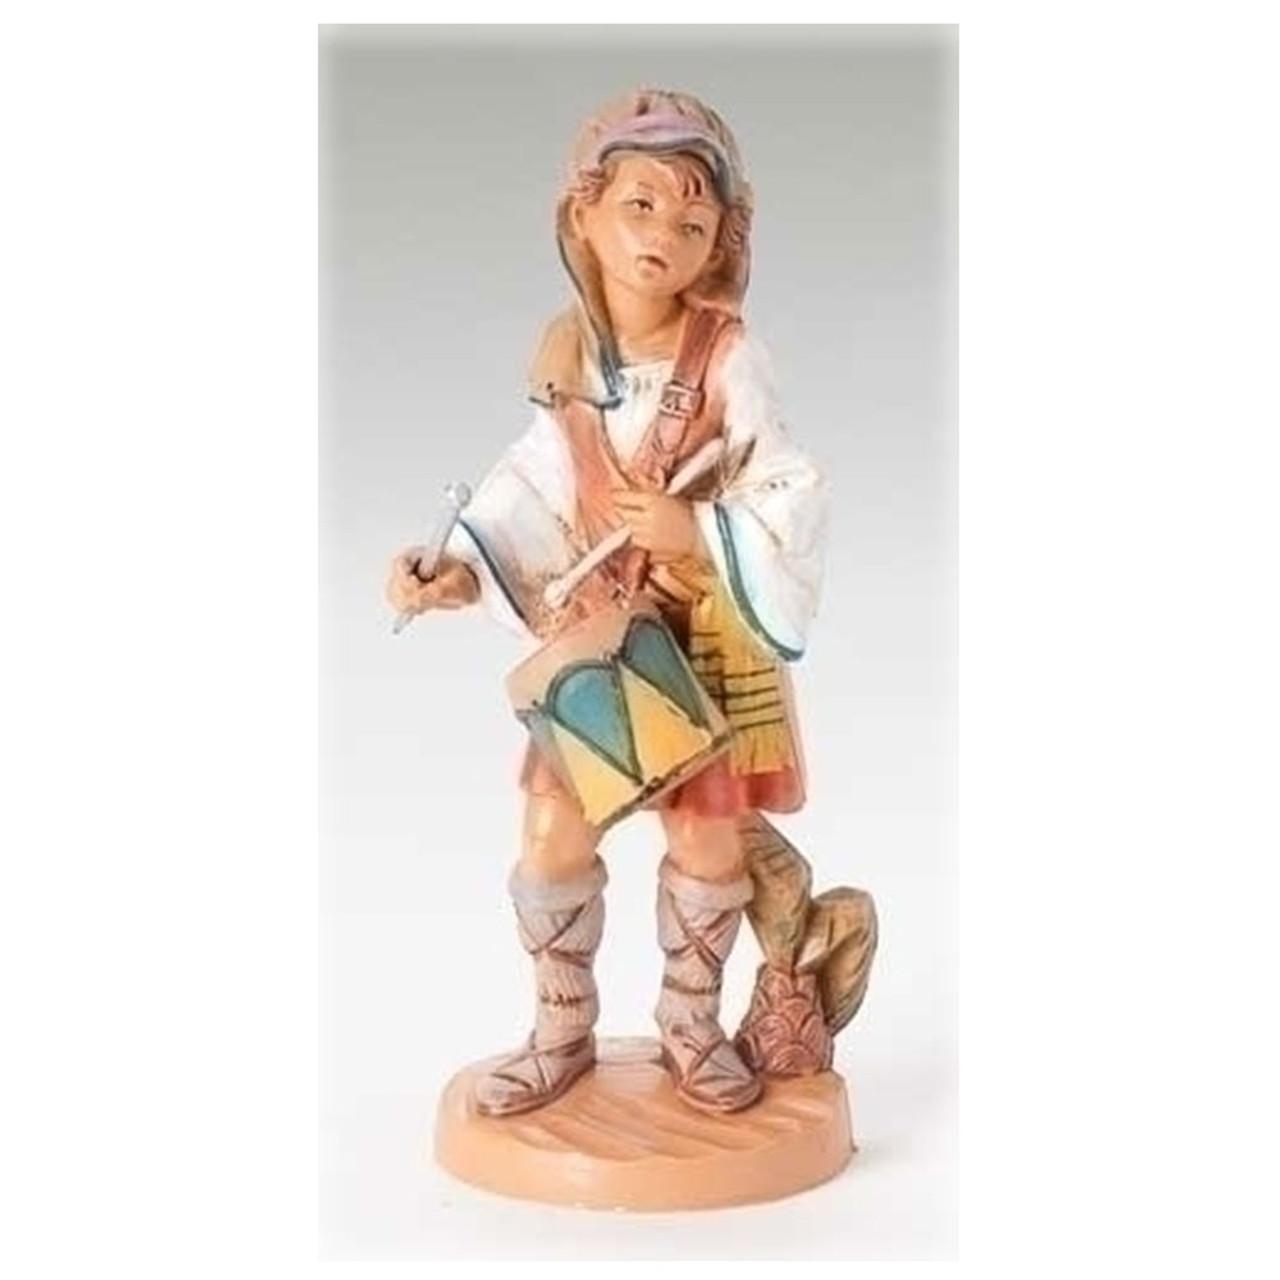 "5"" Scale Fontanini Drummer Boy Nativity Figure"